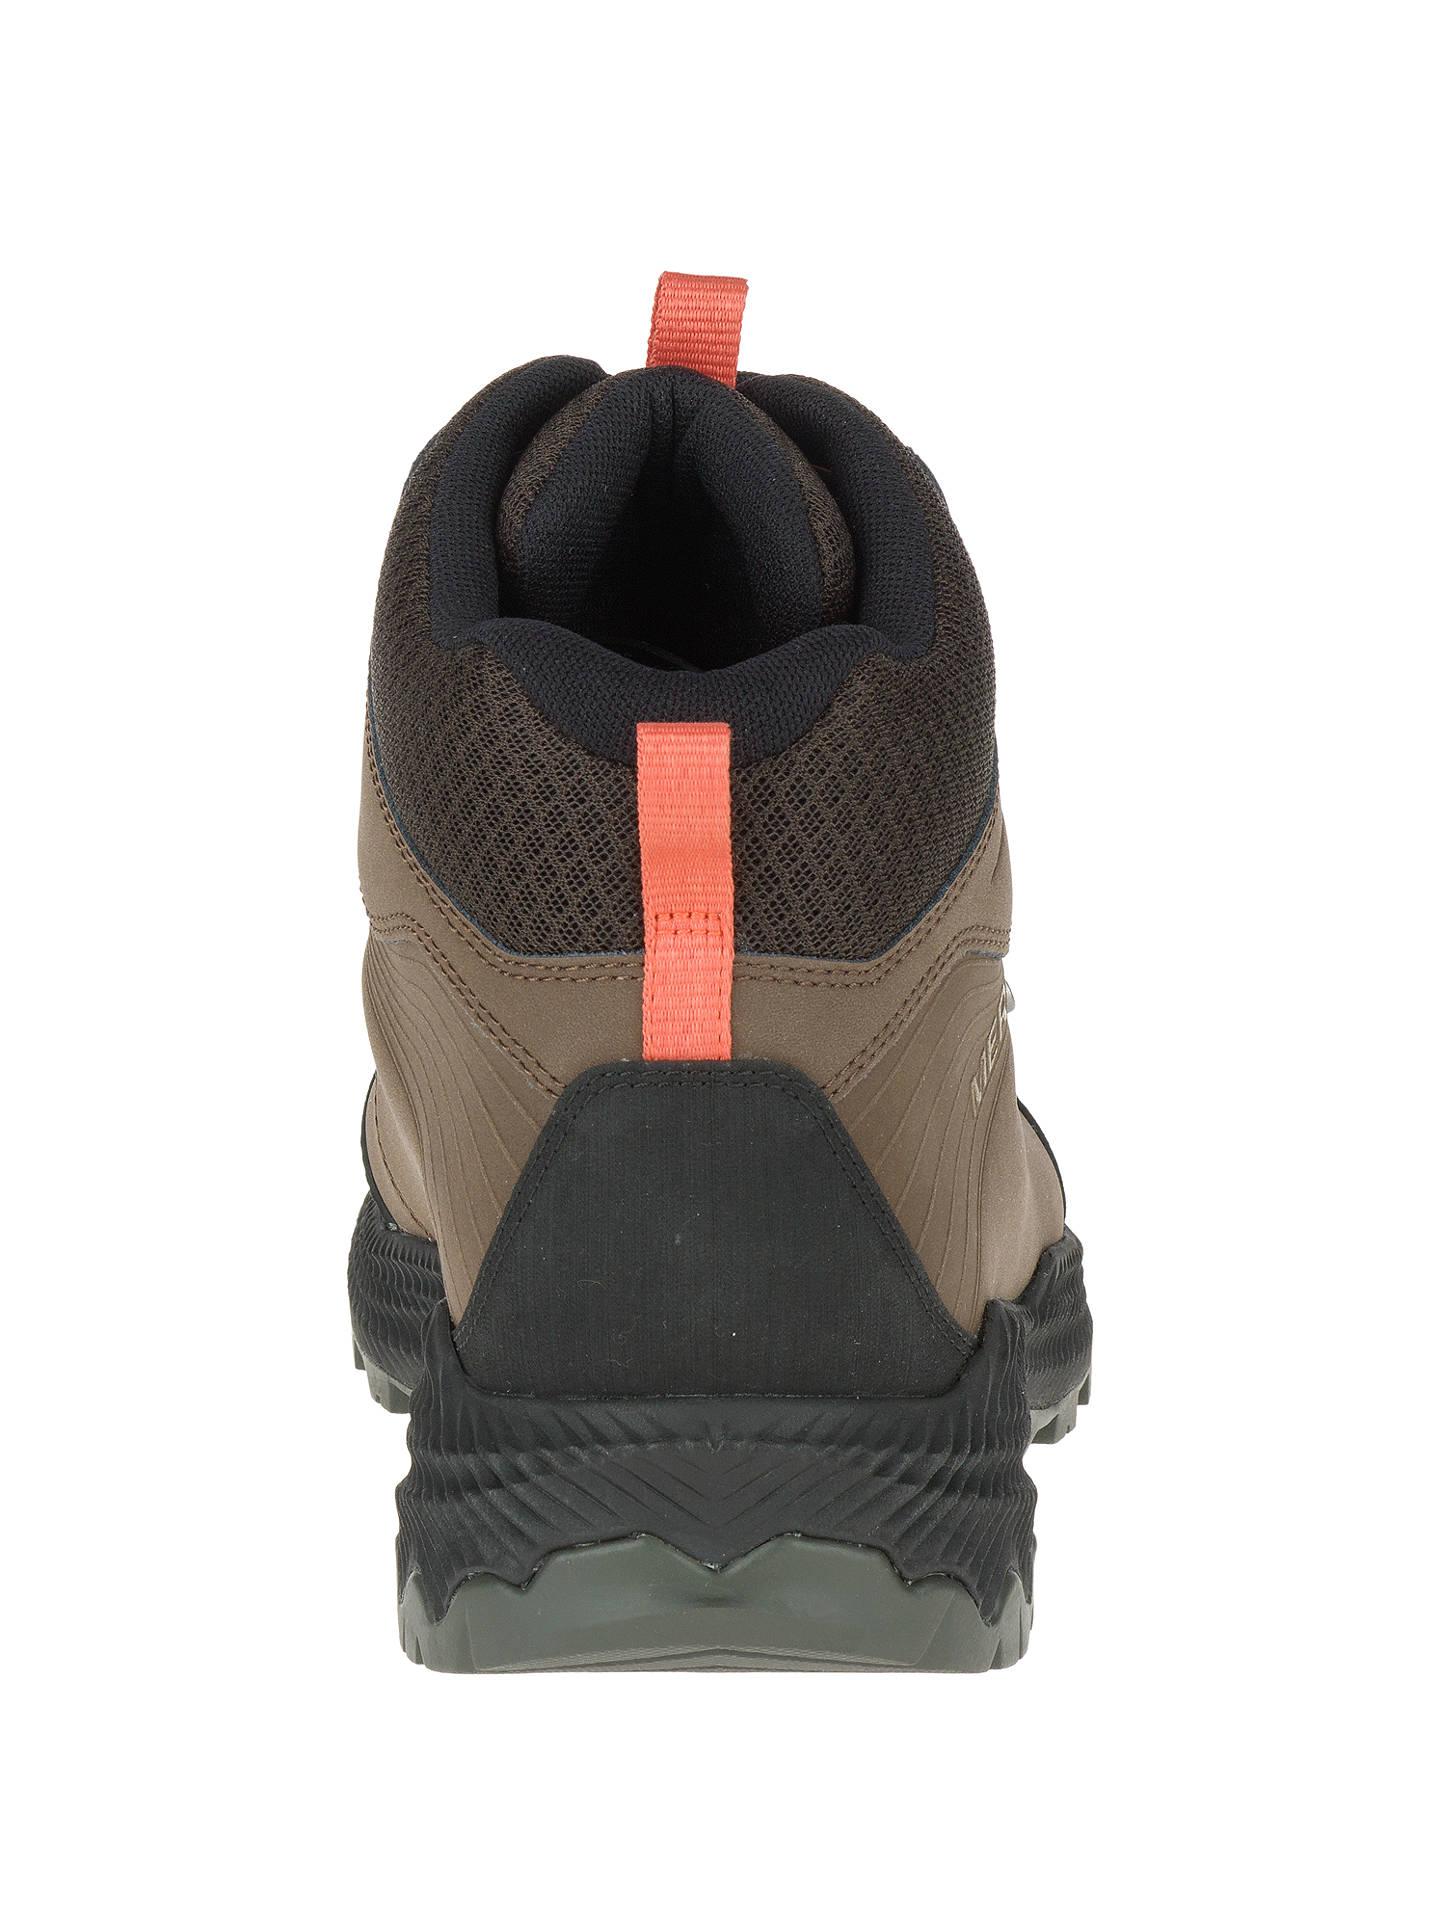 496bc482 Merrell Forestbound Mid Waterproof Men's Walking Boots, Dark Earth ...